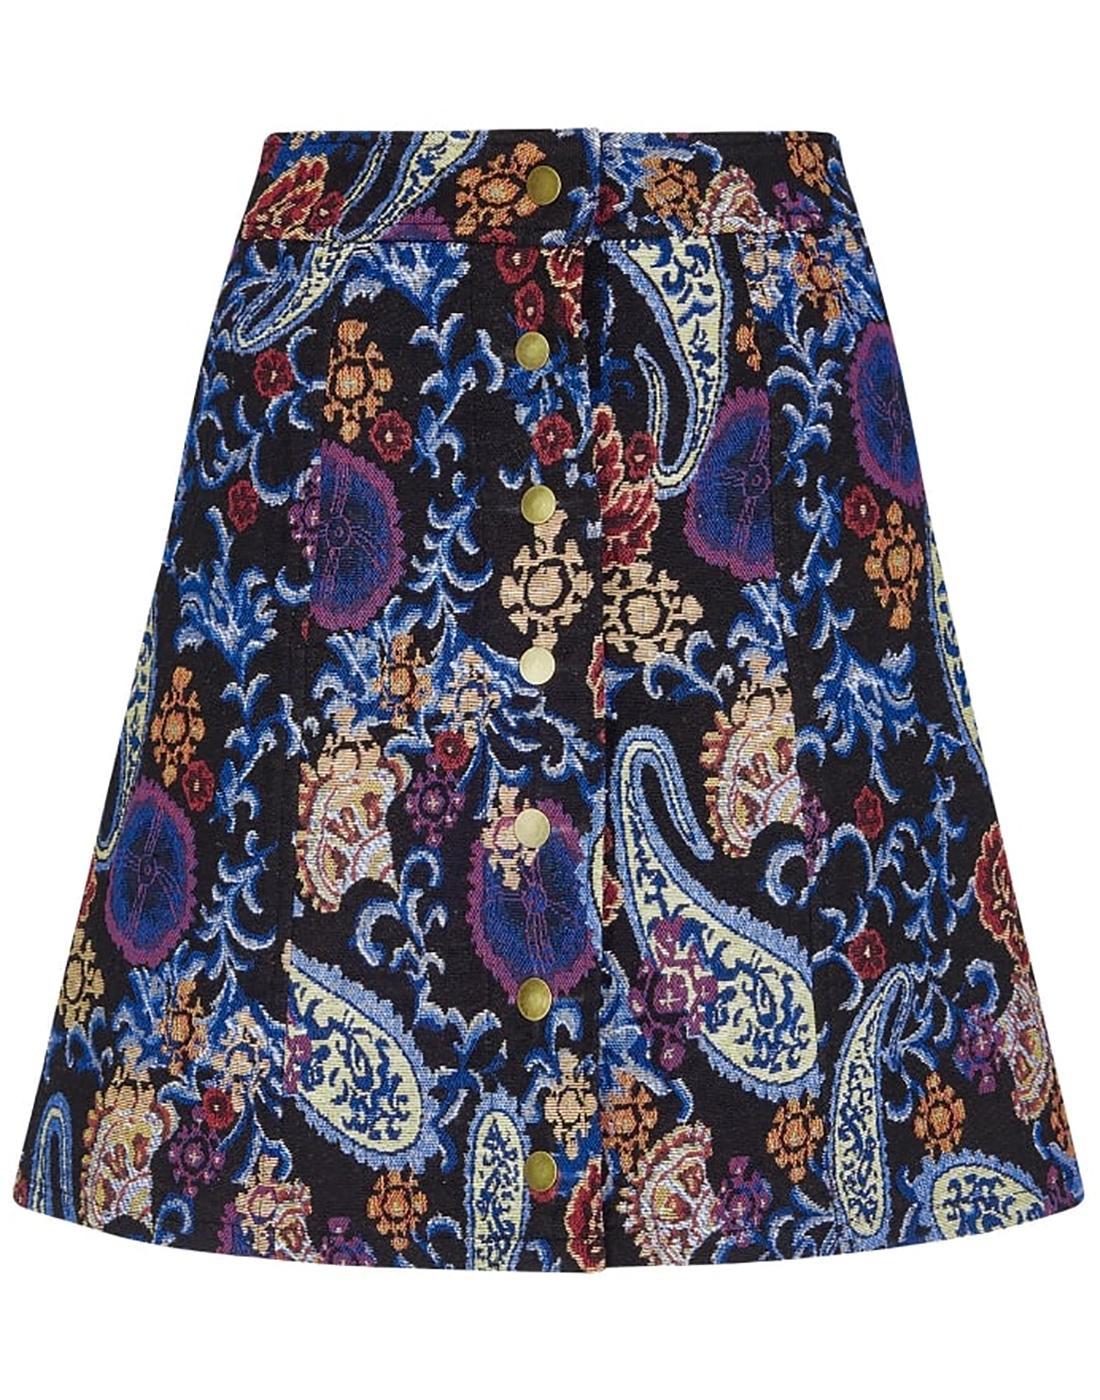 India BRIGHT & BEAUTIFUL 60s Paisley Mini Skirt